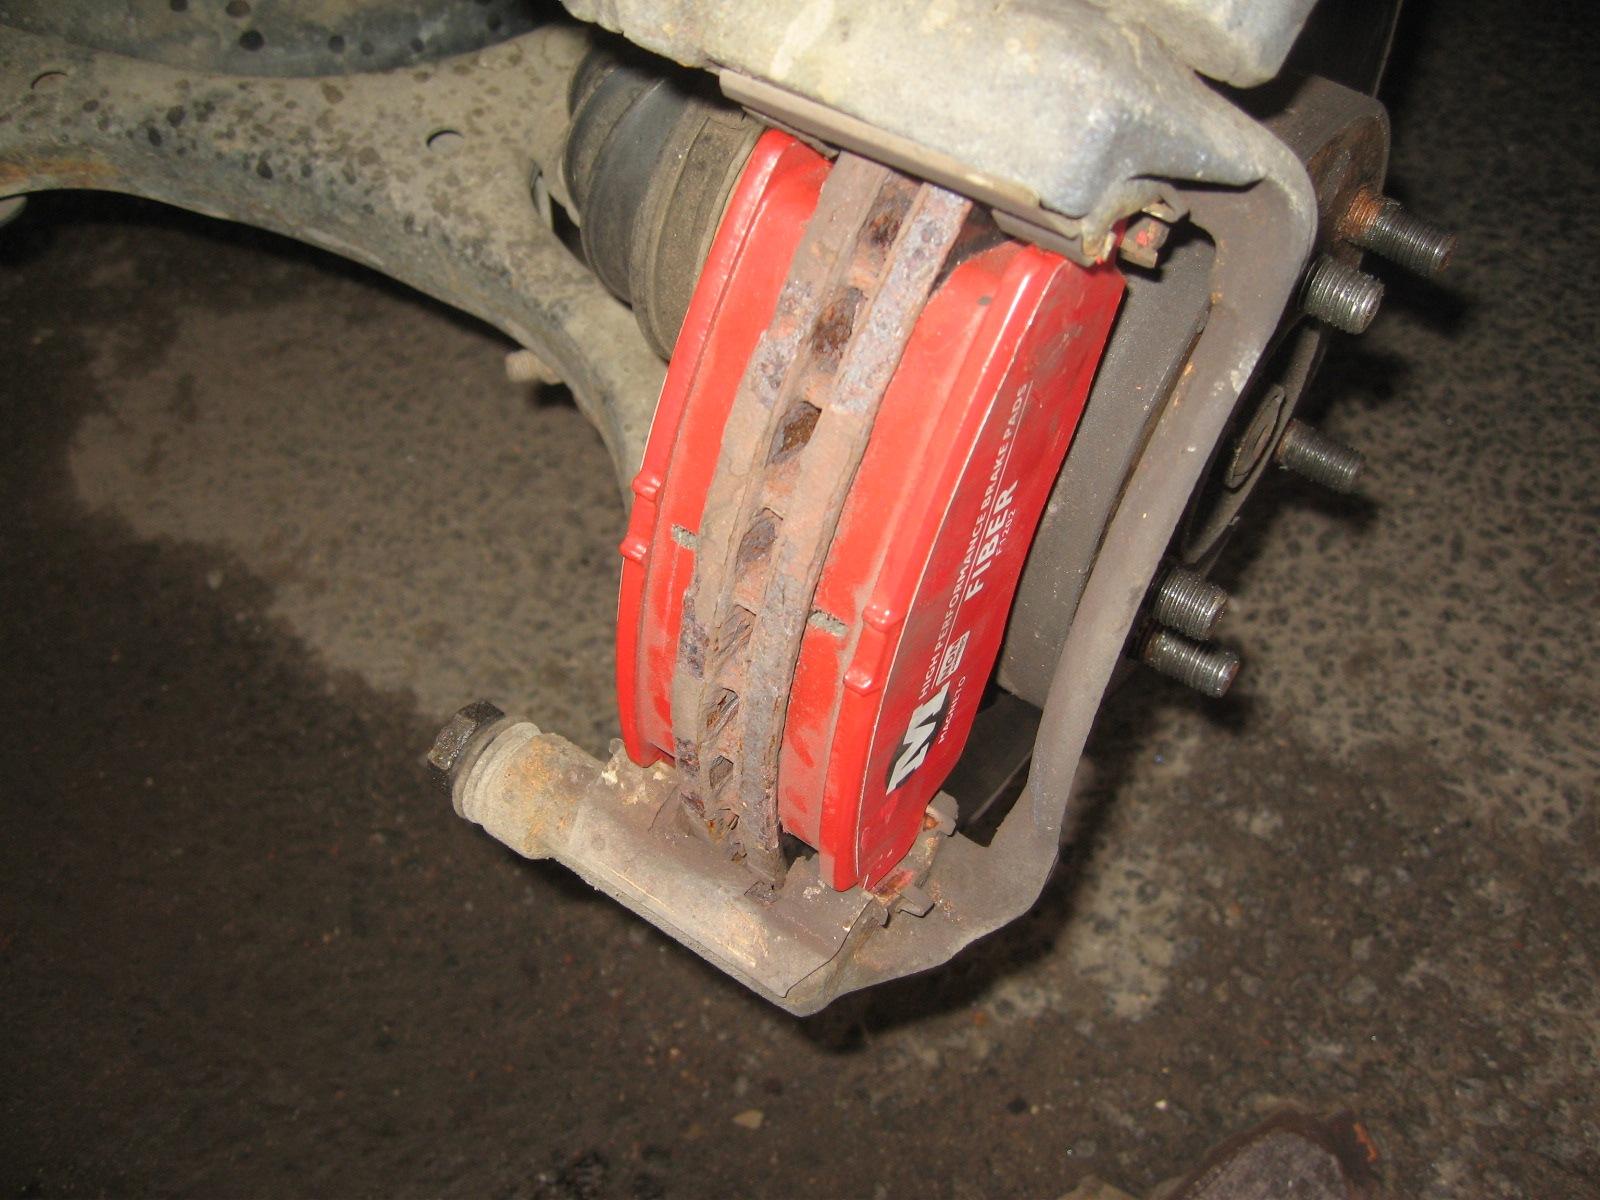 Замена передних тормозных колодок. Фотоотчет. - бортжурнал Honda Civic 2008 года на DRIVE2